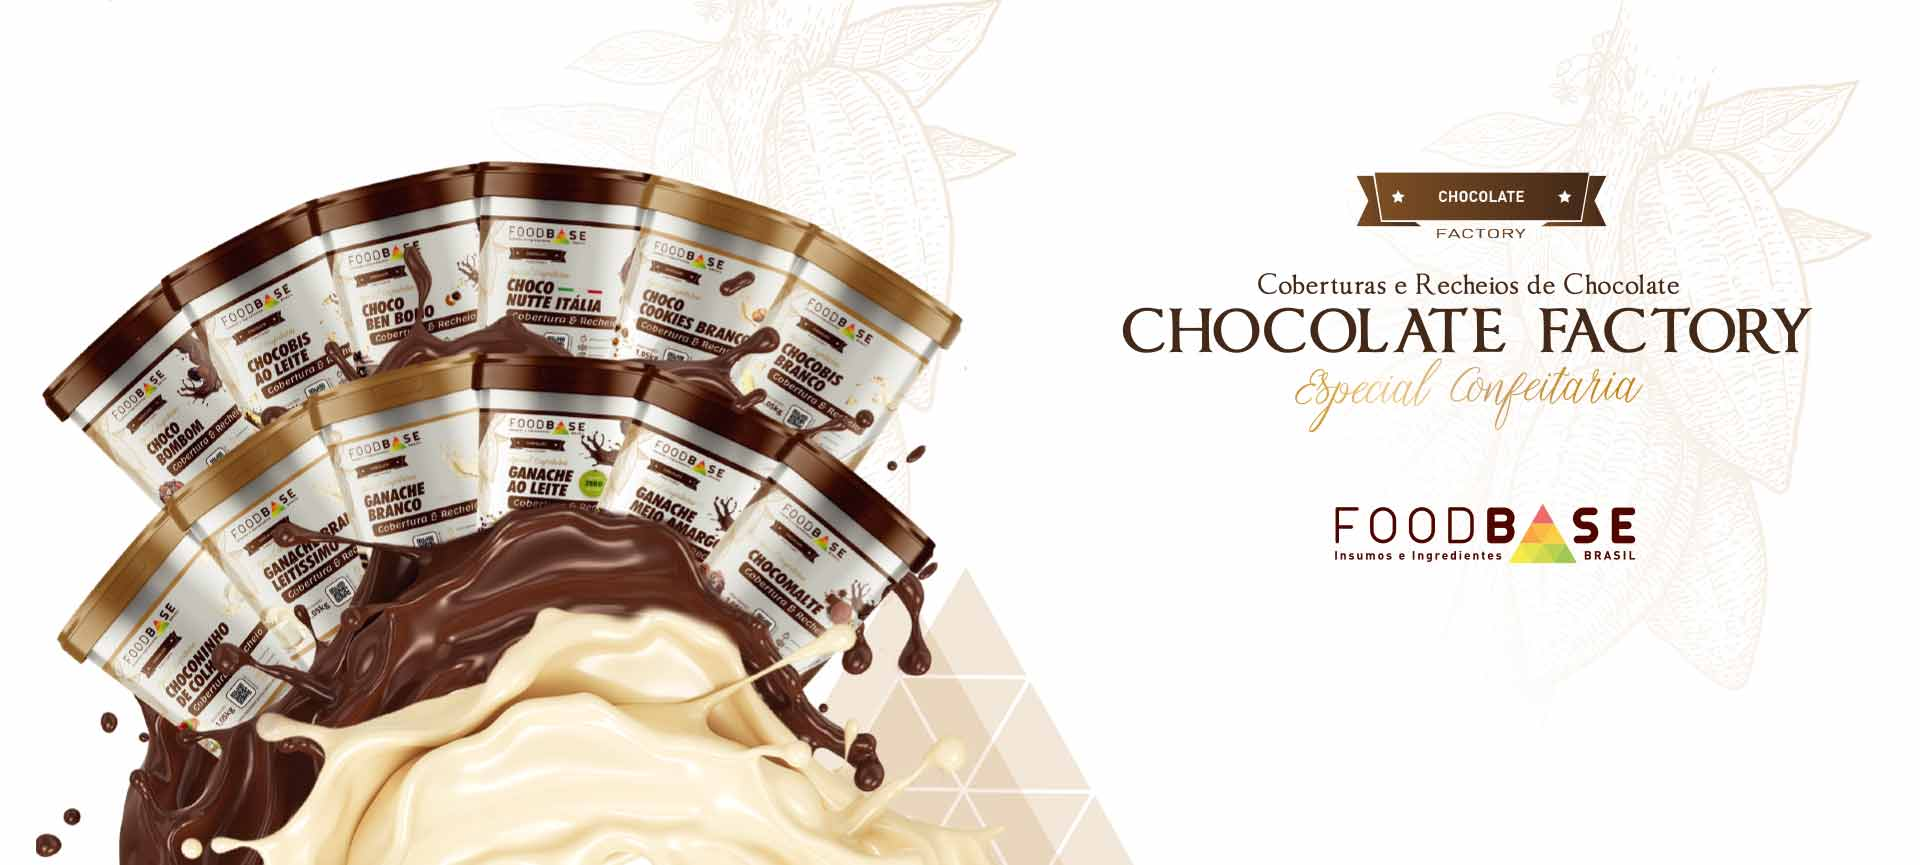 Foodbase - Coberturas e recheios de chocolate Foodbase